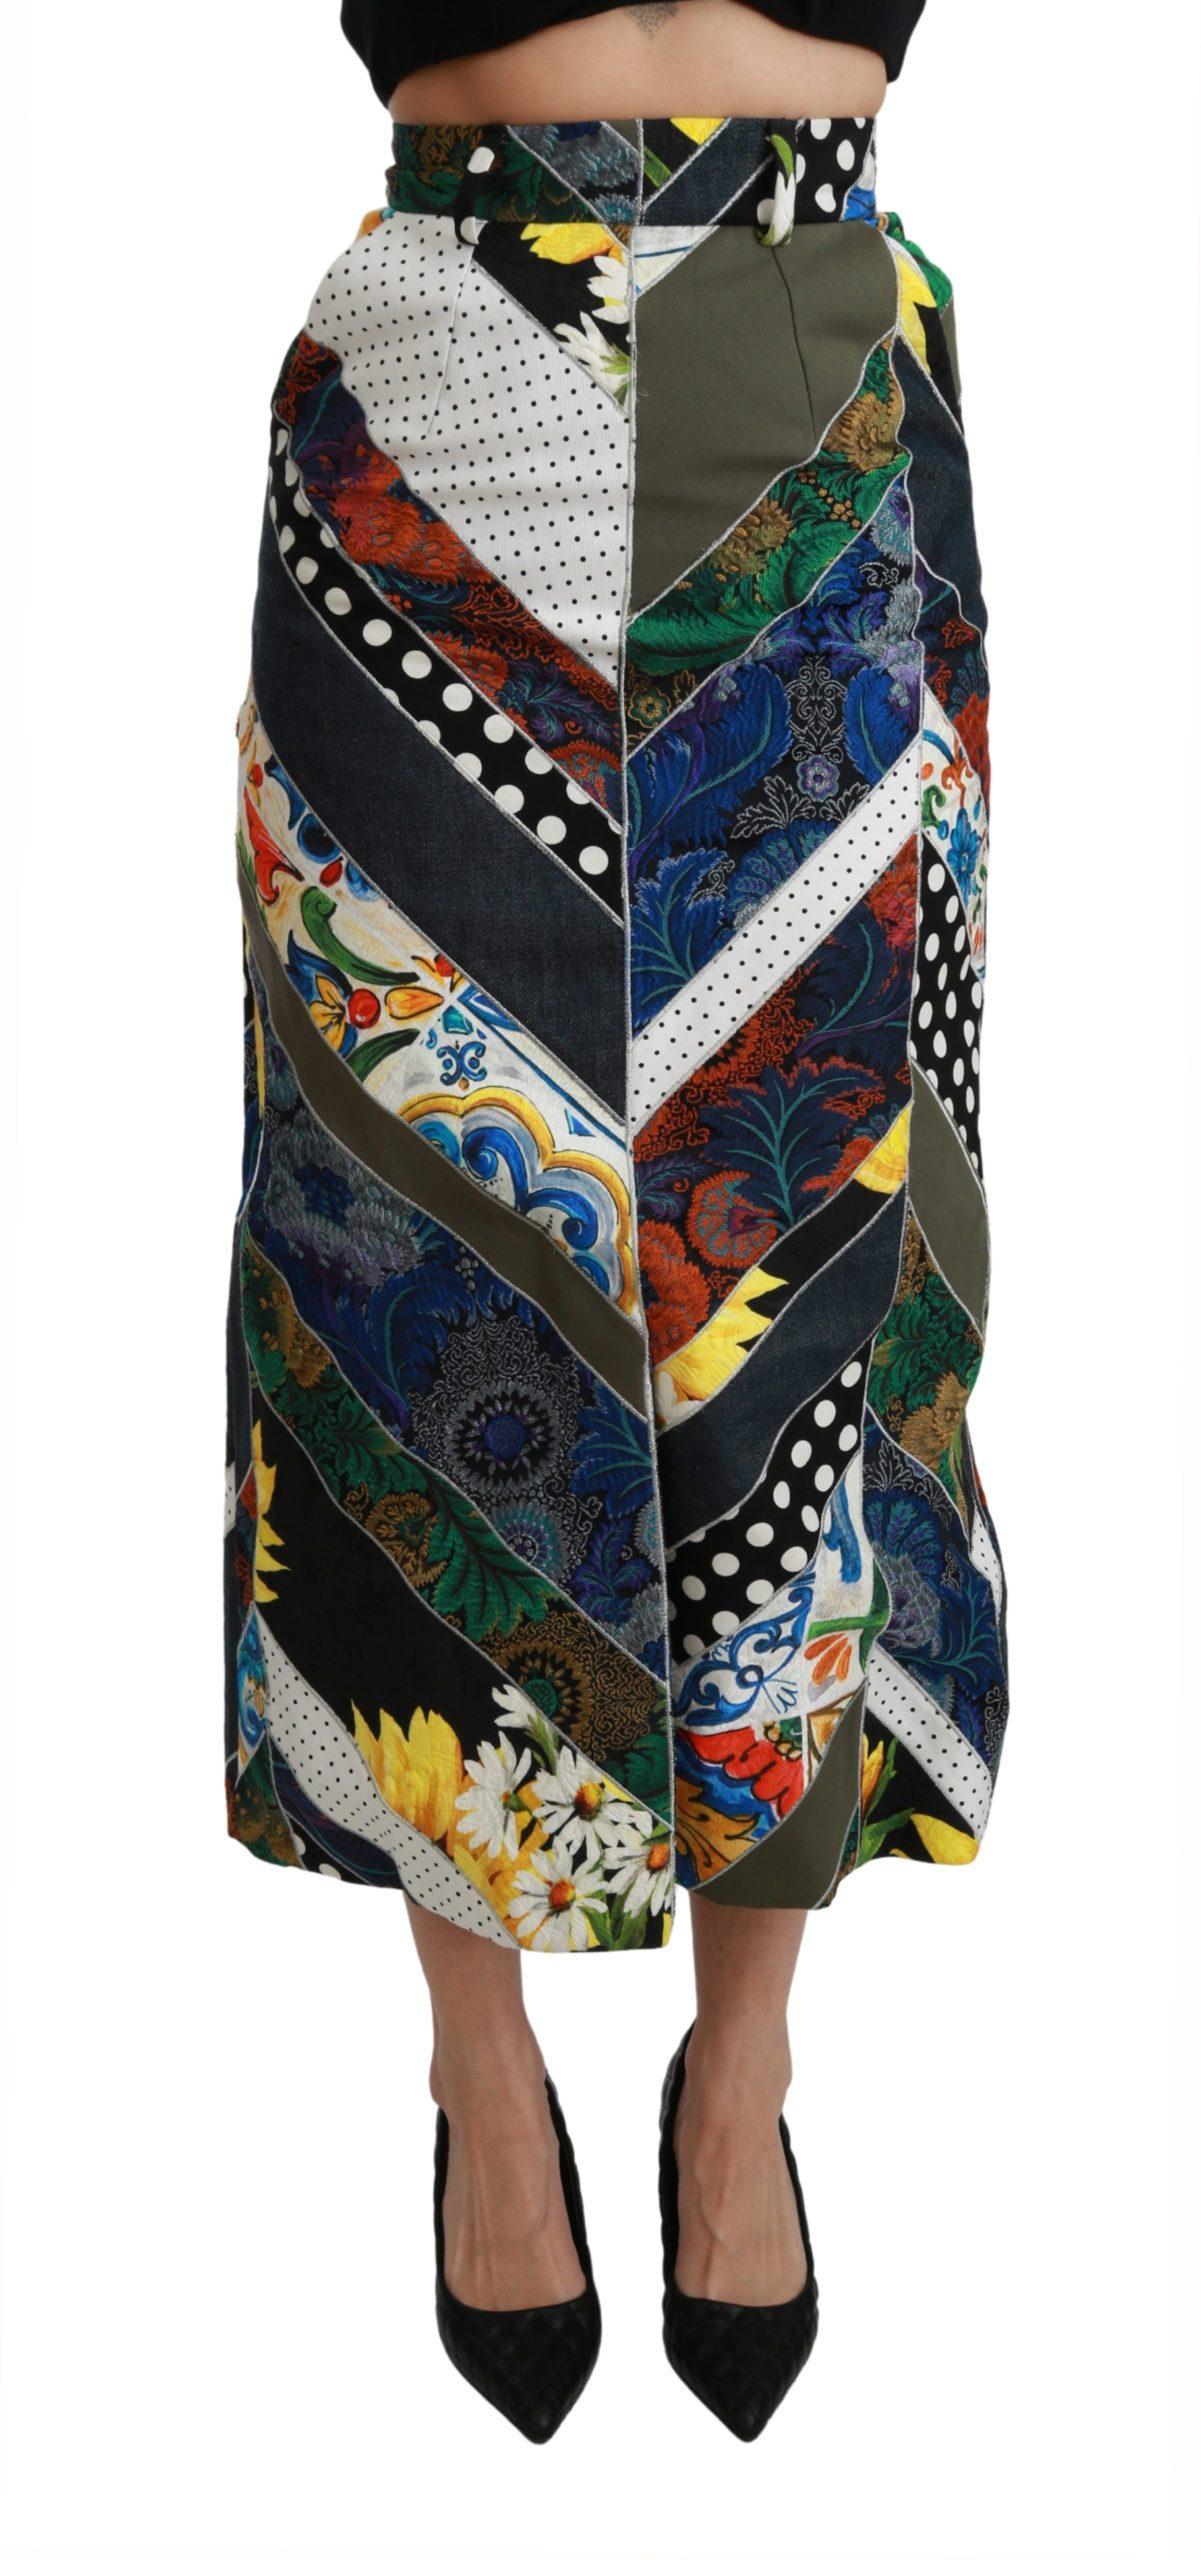 Dolce & Gabbana Women's Silk Geometric High Waist Maxi Skirt Multicolor SKI1429 - IT40|S